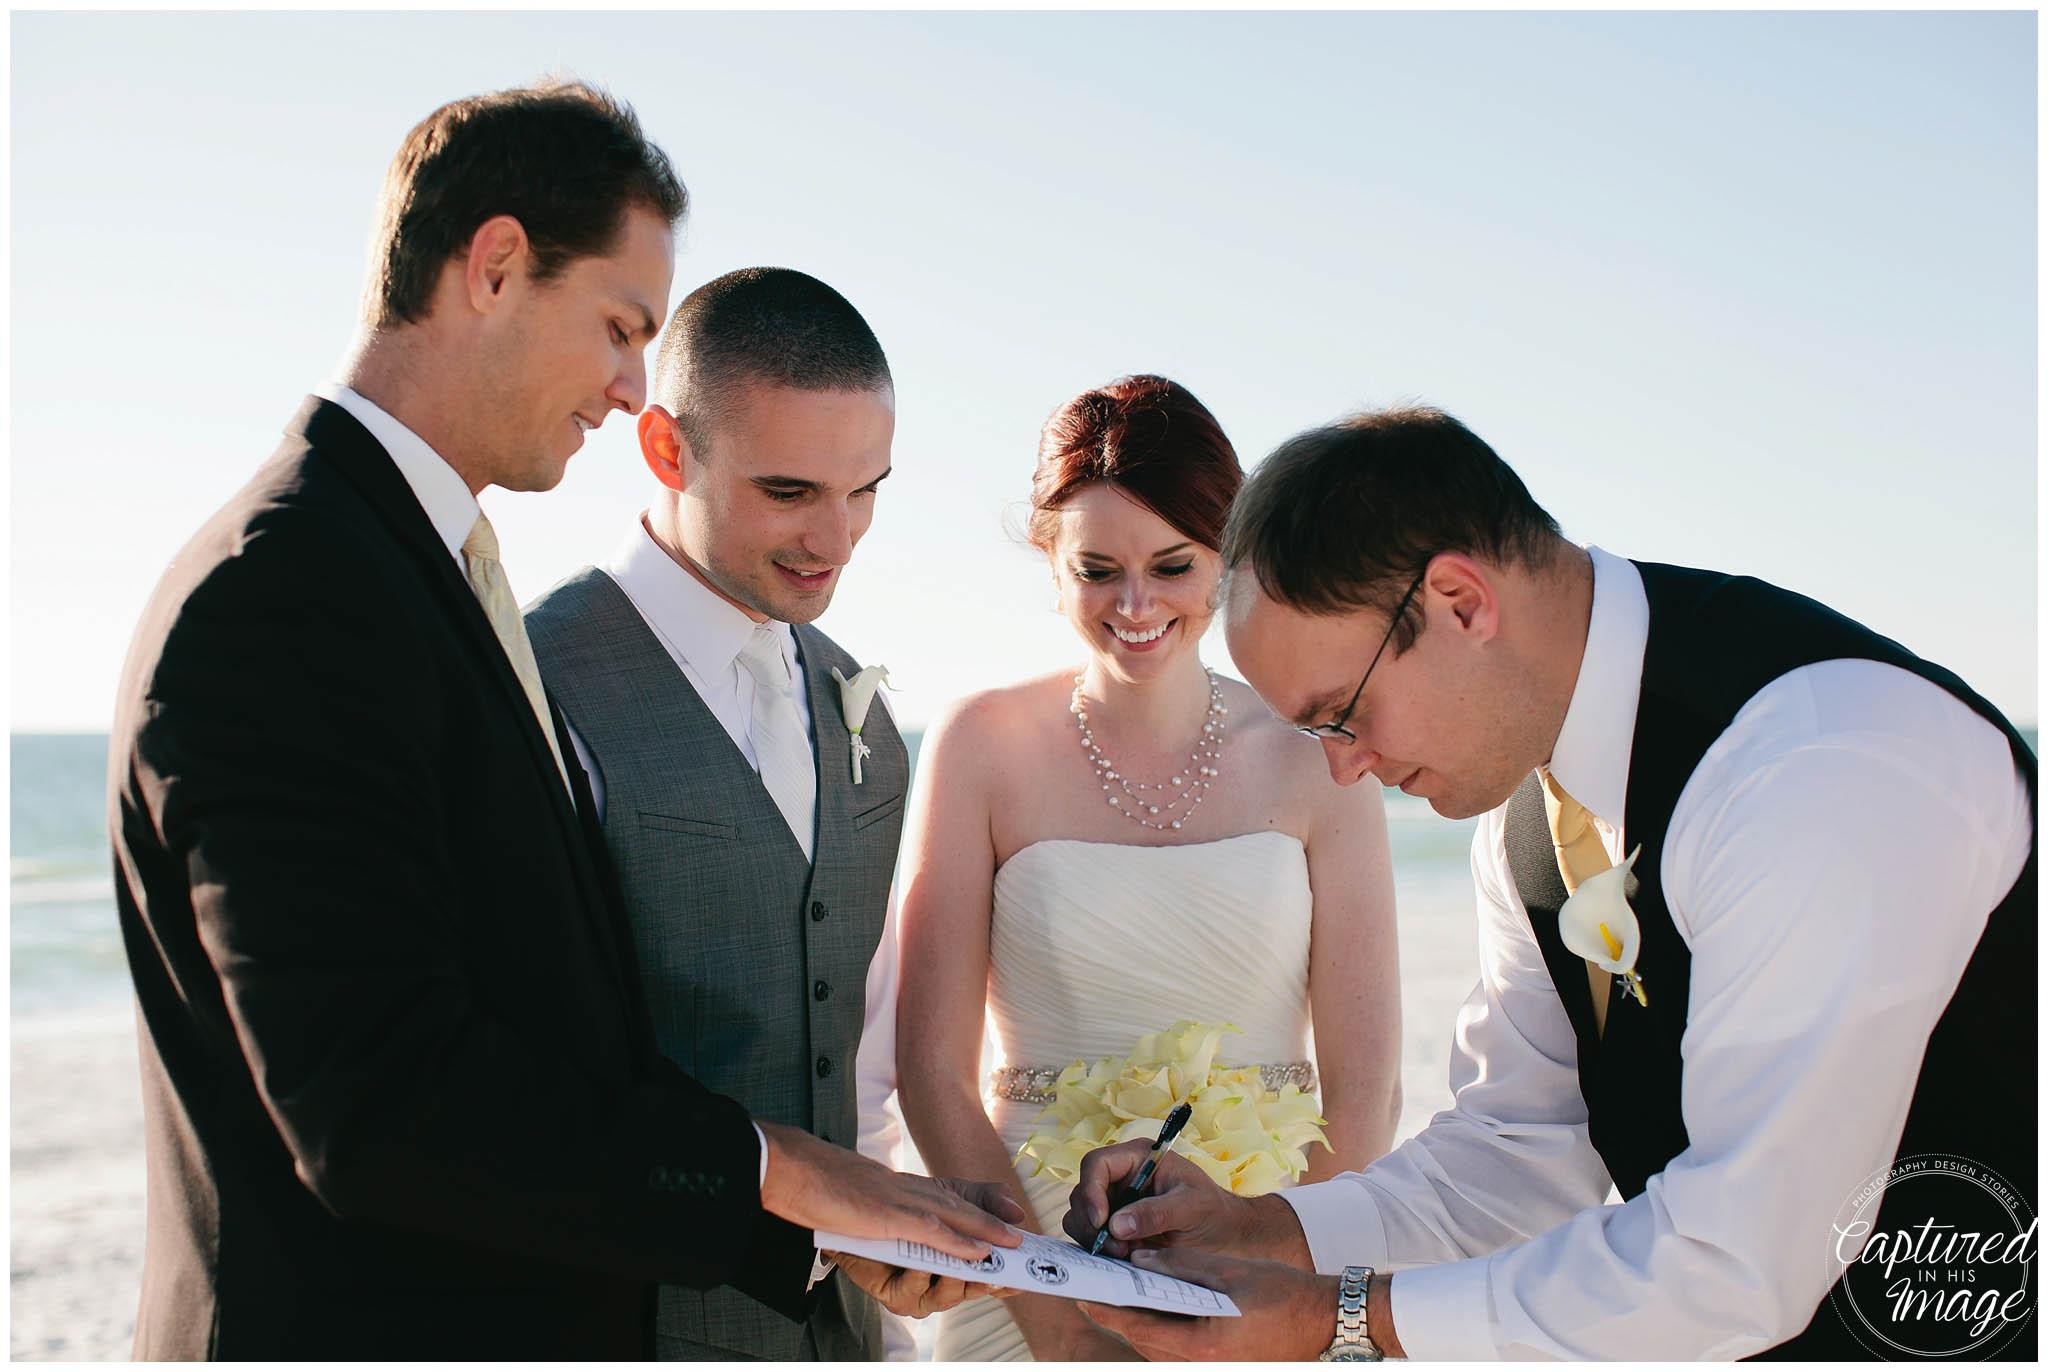 St. Pete Beach Destination Wedding (8 of 81)